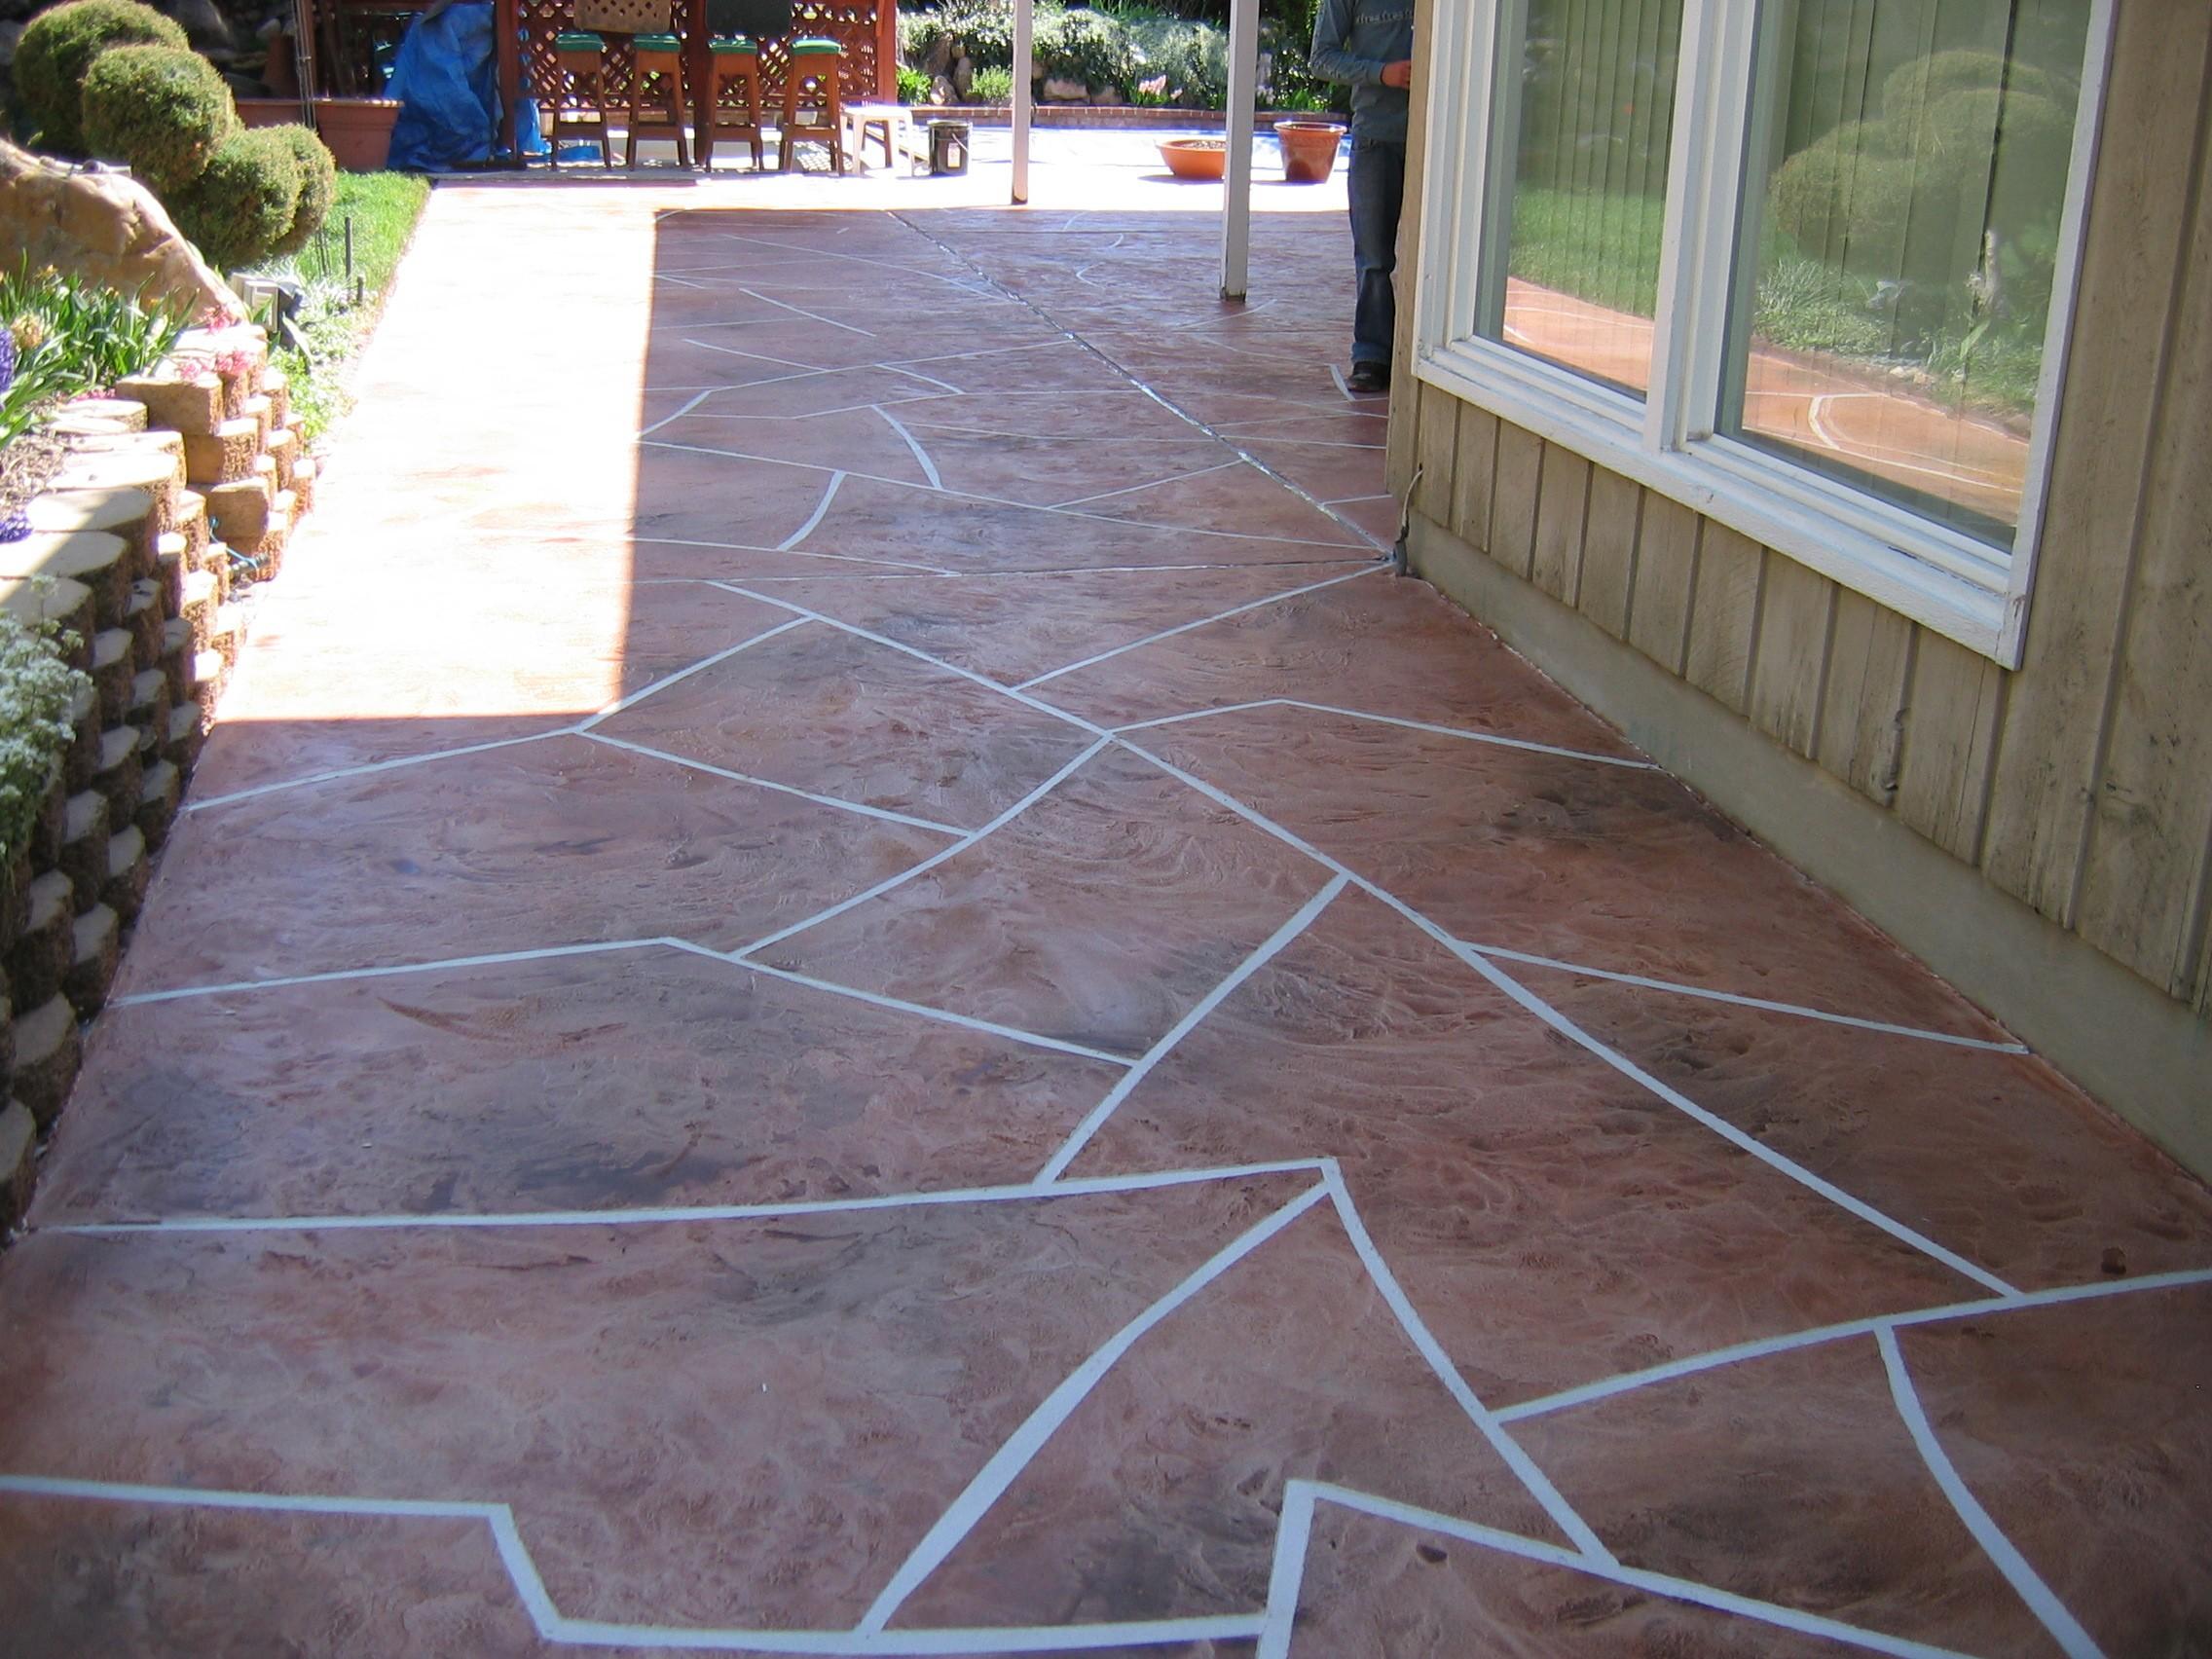 Concrete Patio Stone Pattern Overlay | Concrete Design Systems   Salt Lake  City, Utah